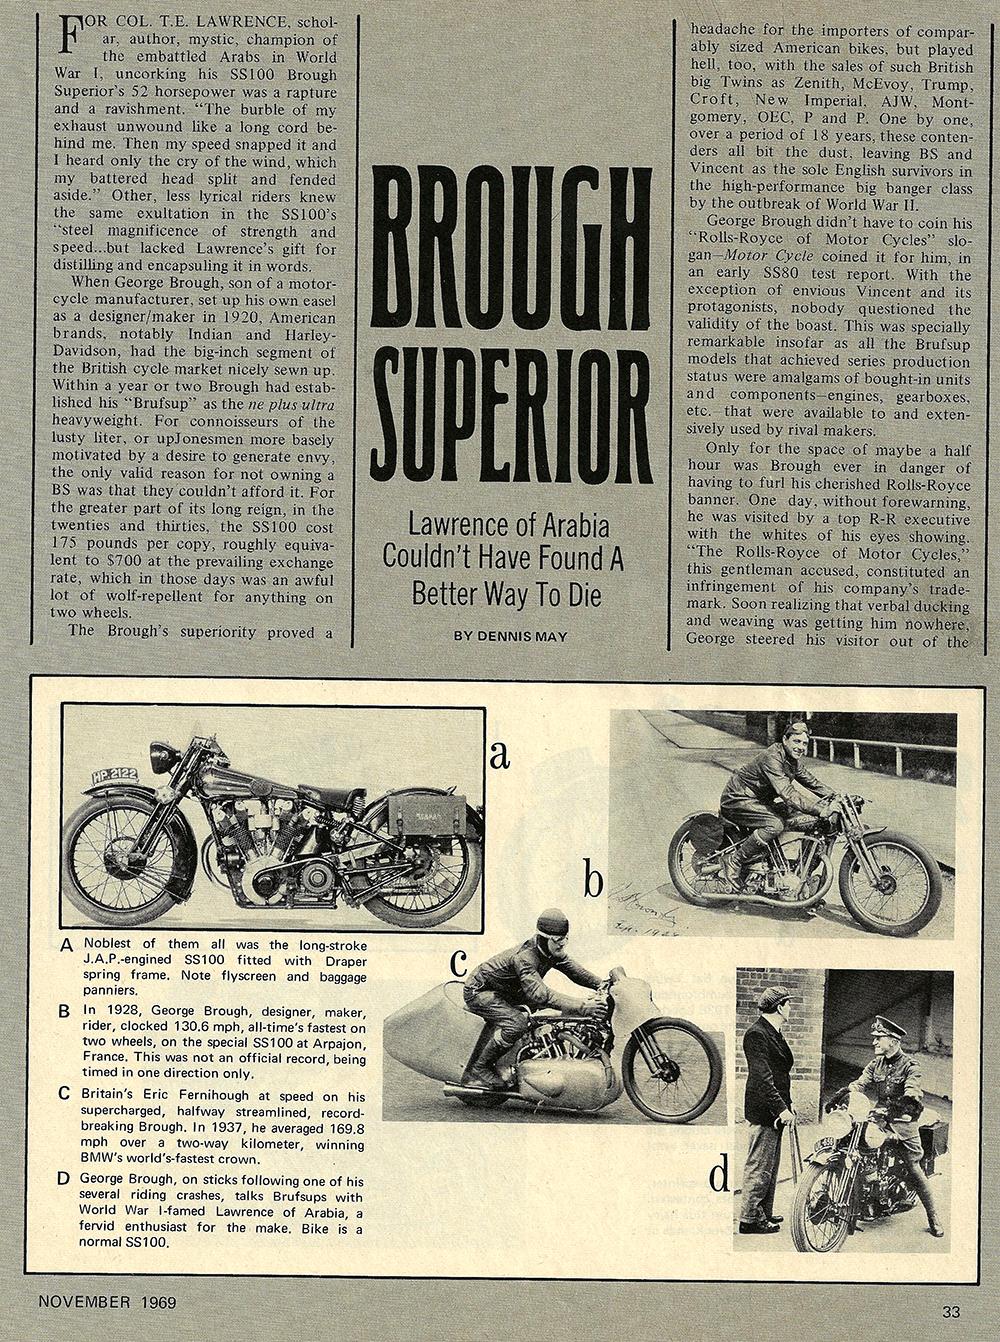 History of Brough Superior 01.jpg